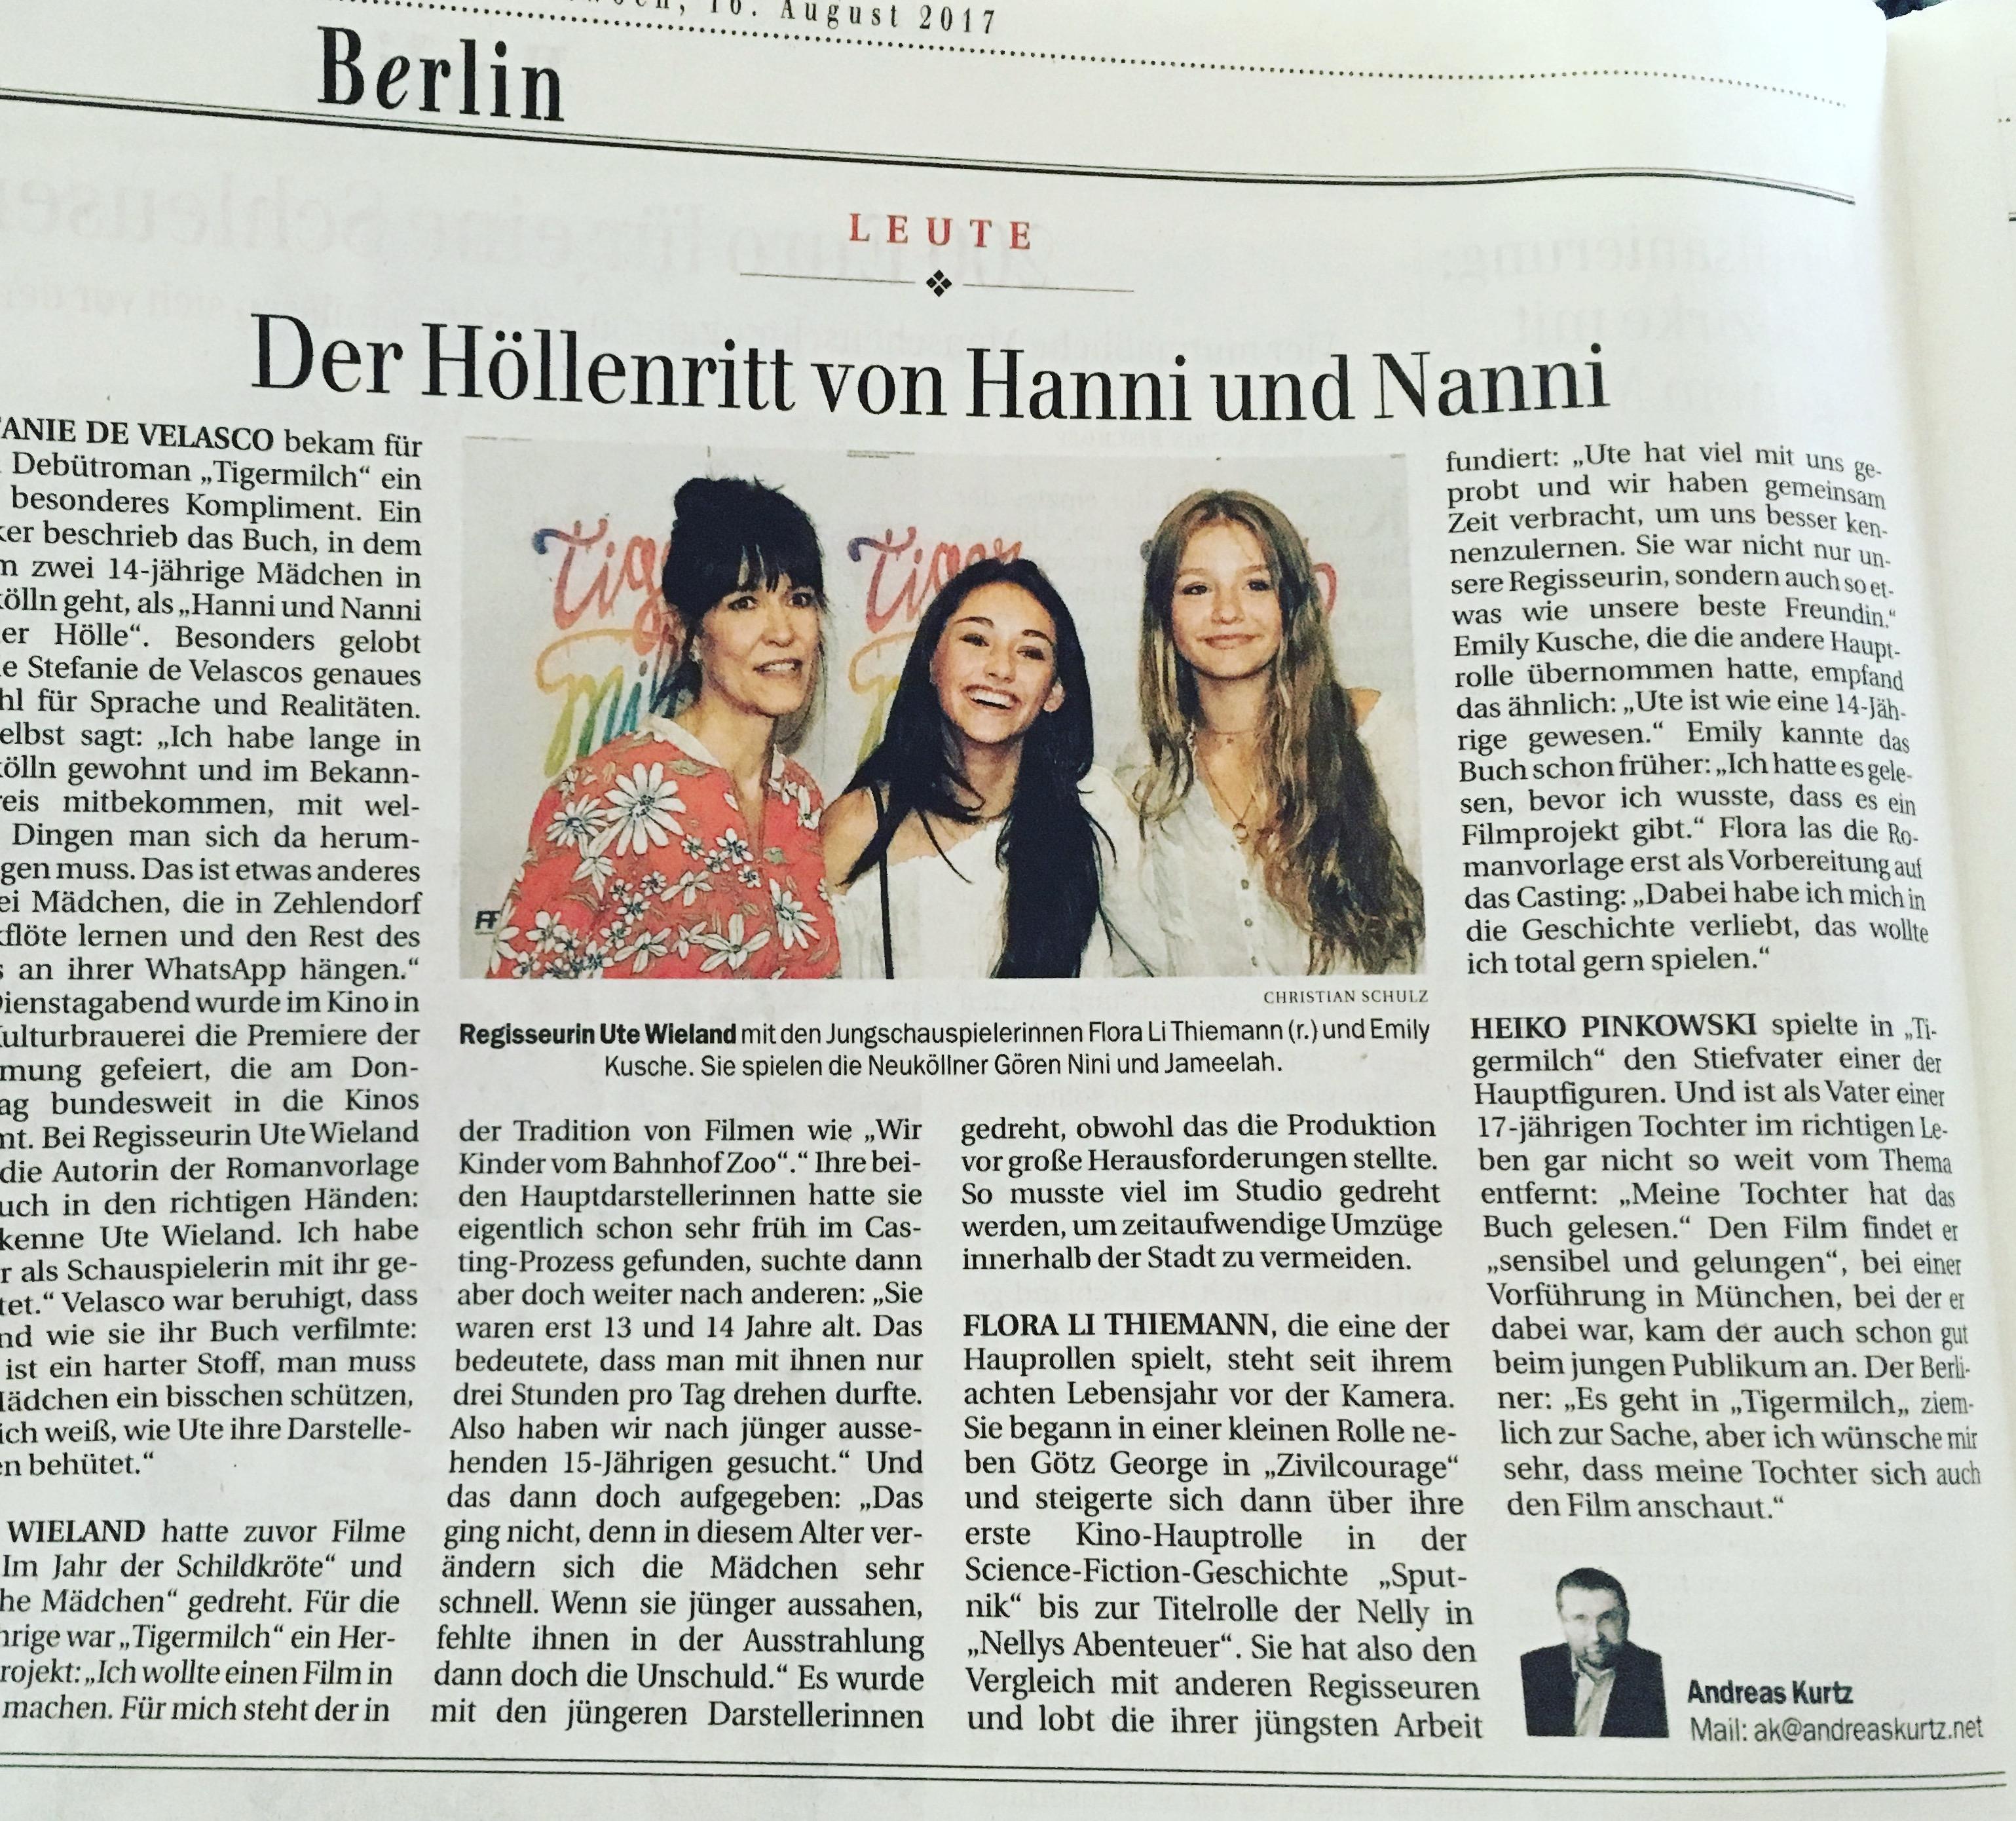 Heiko Pinkowski @ Berliner Zeitung